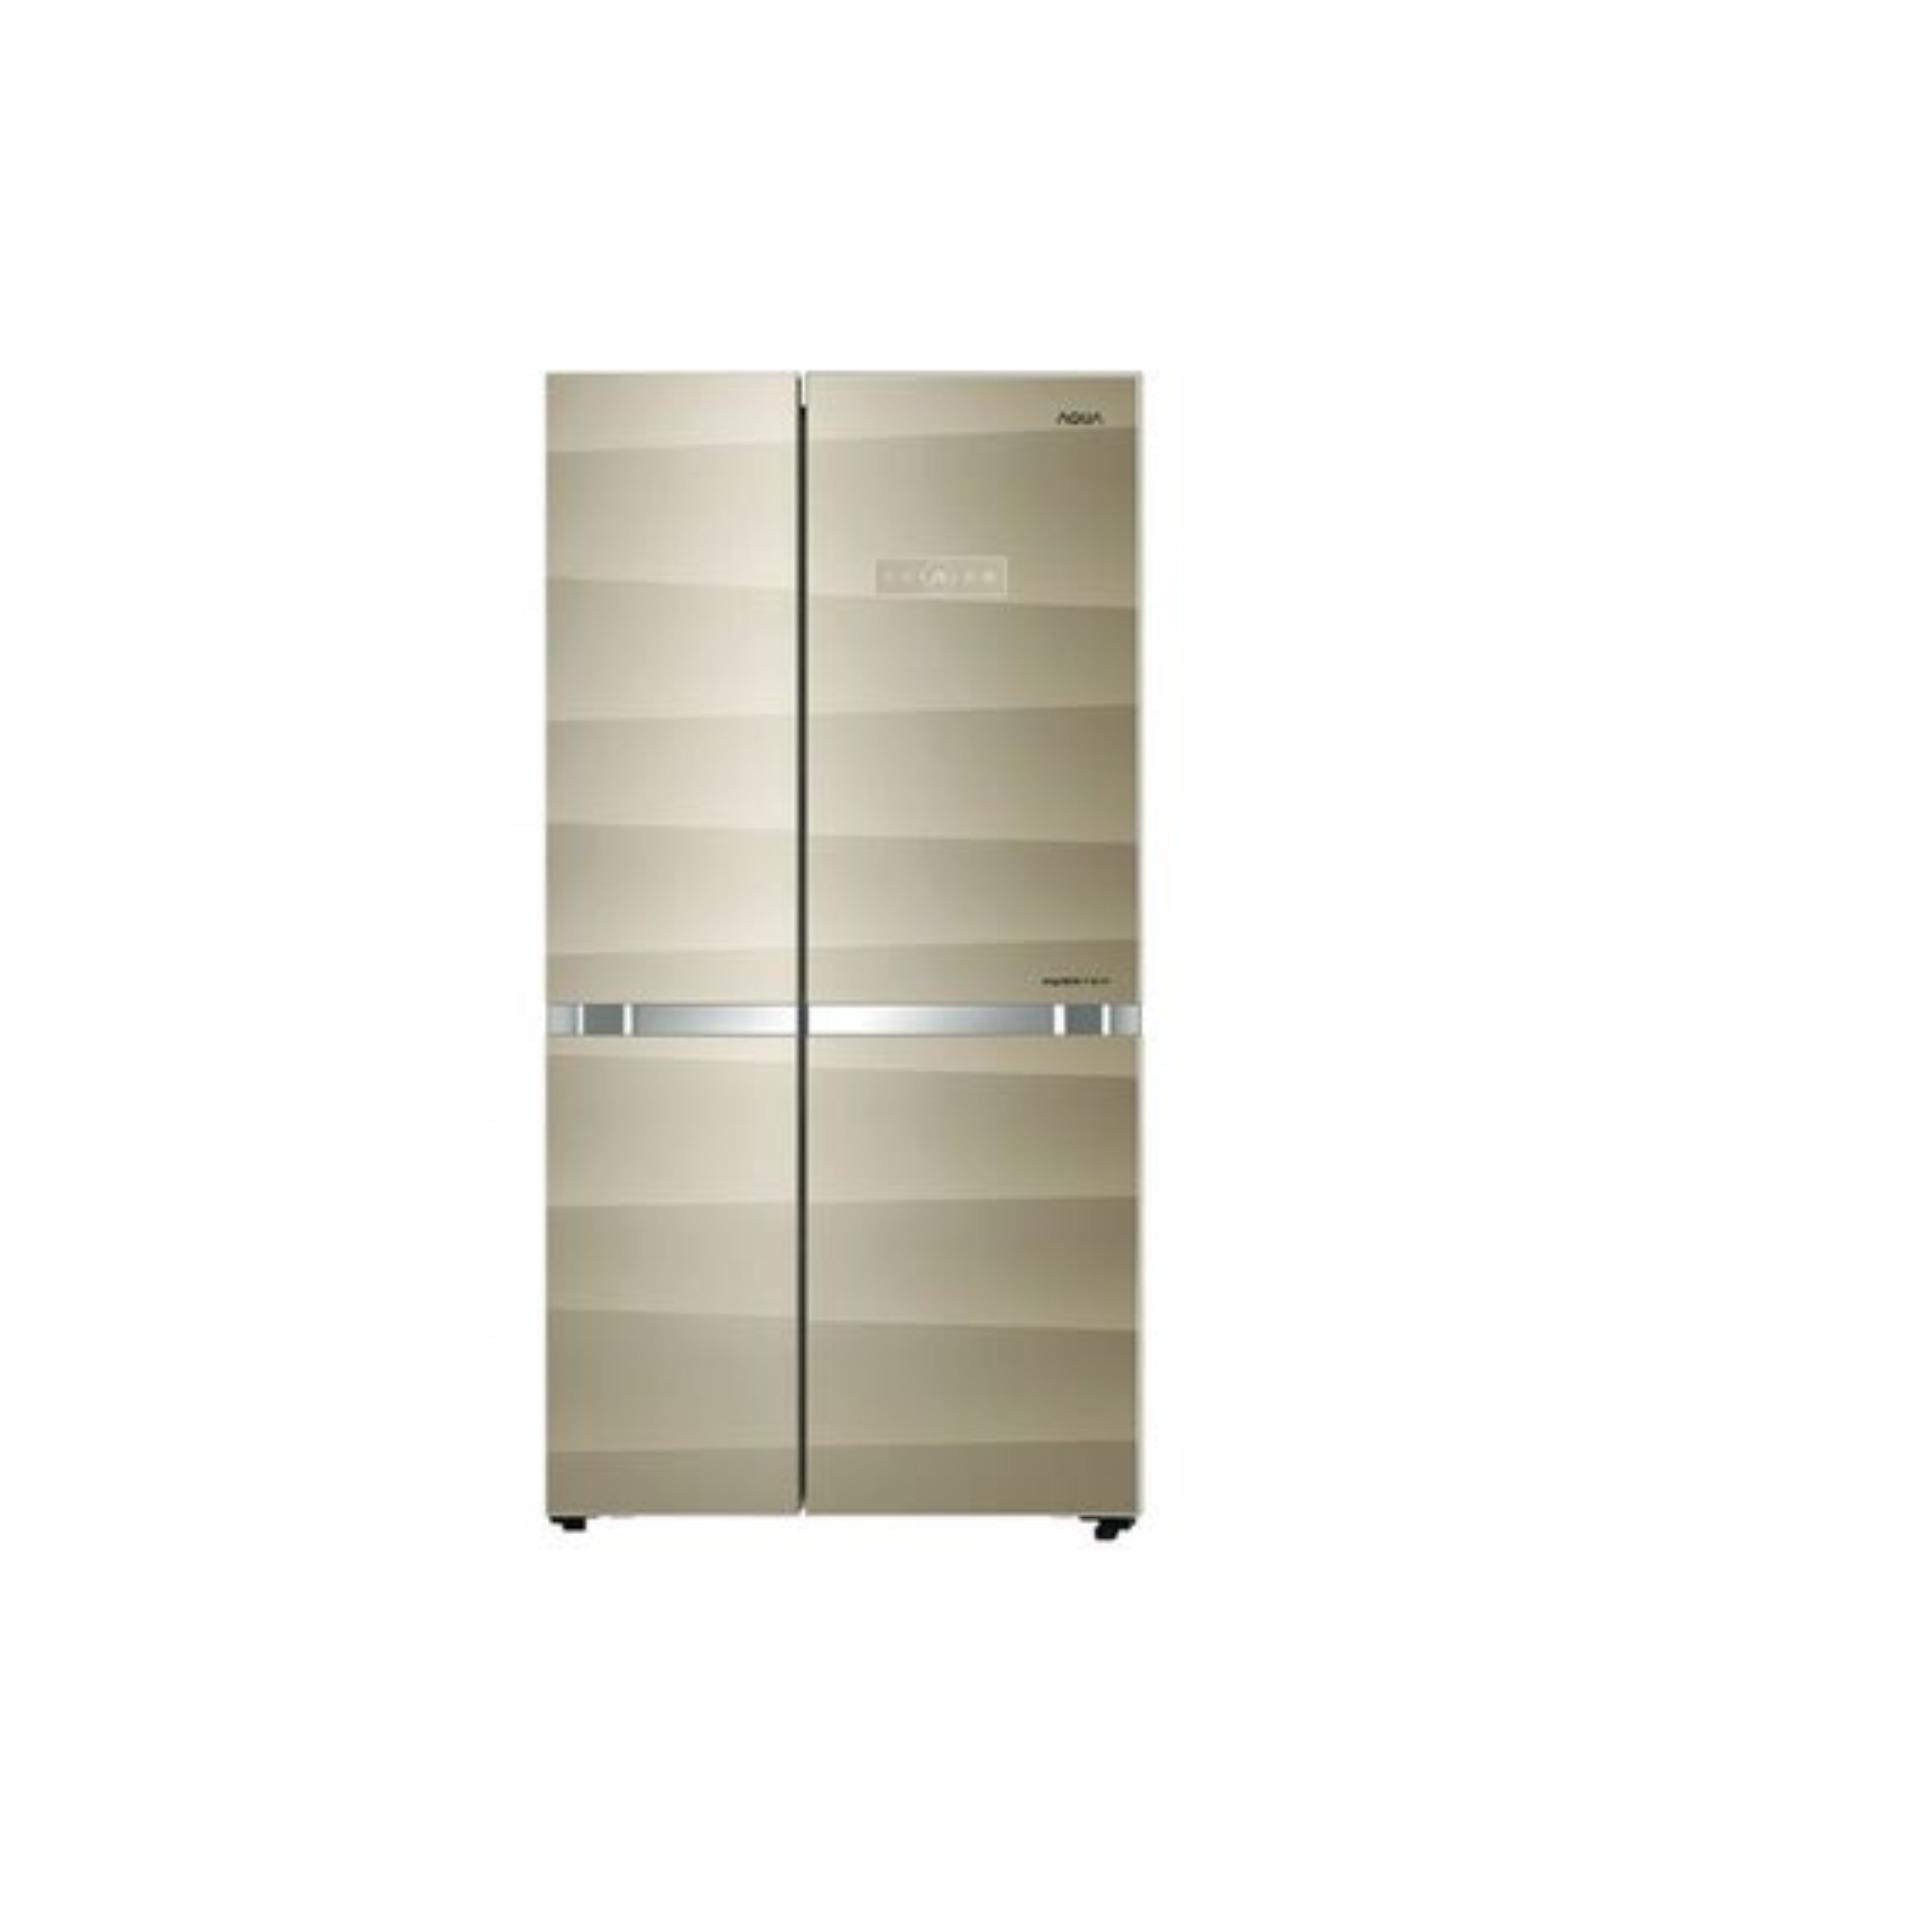 Tủ lạnh Aqua AQR-IG585AS(SG)